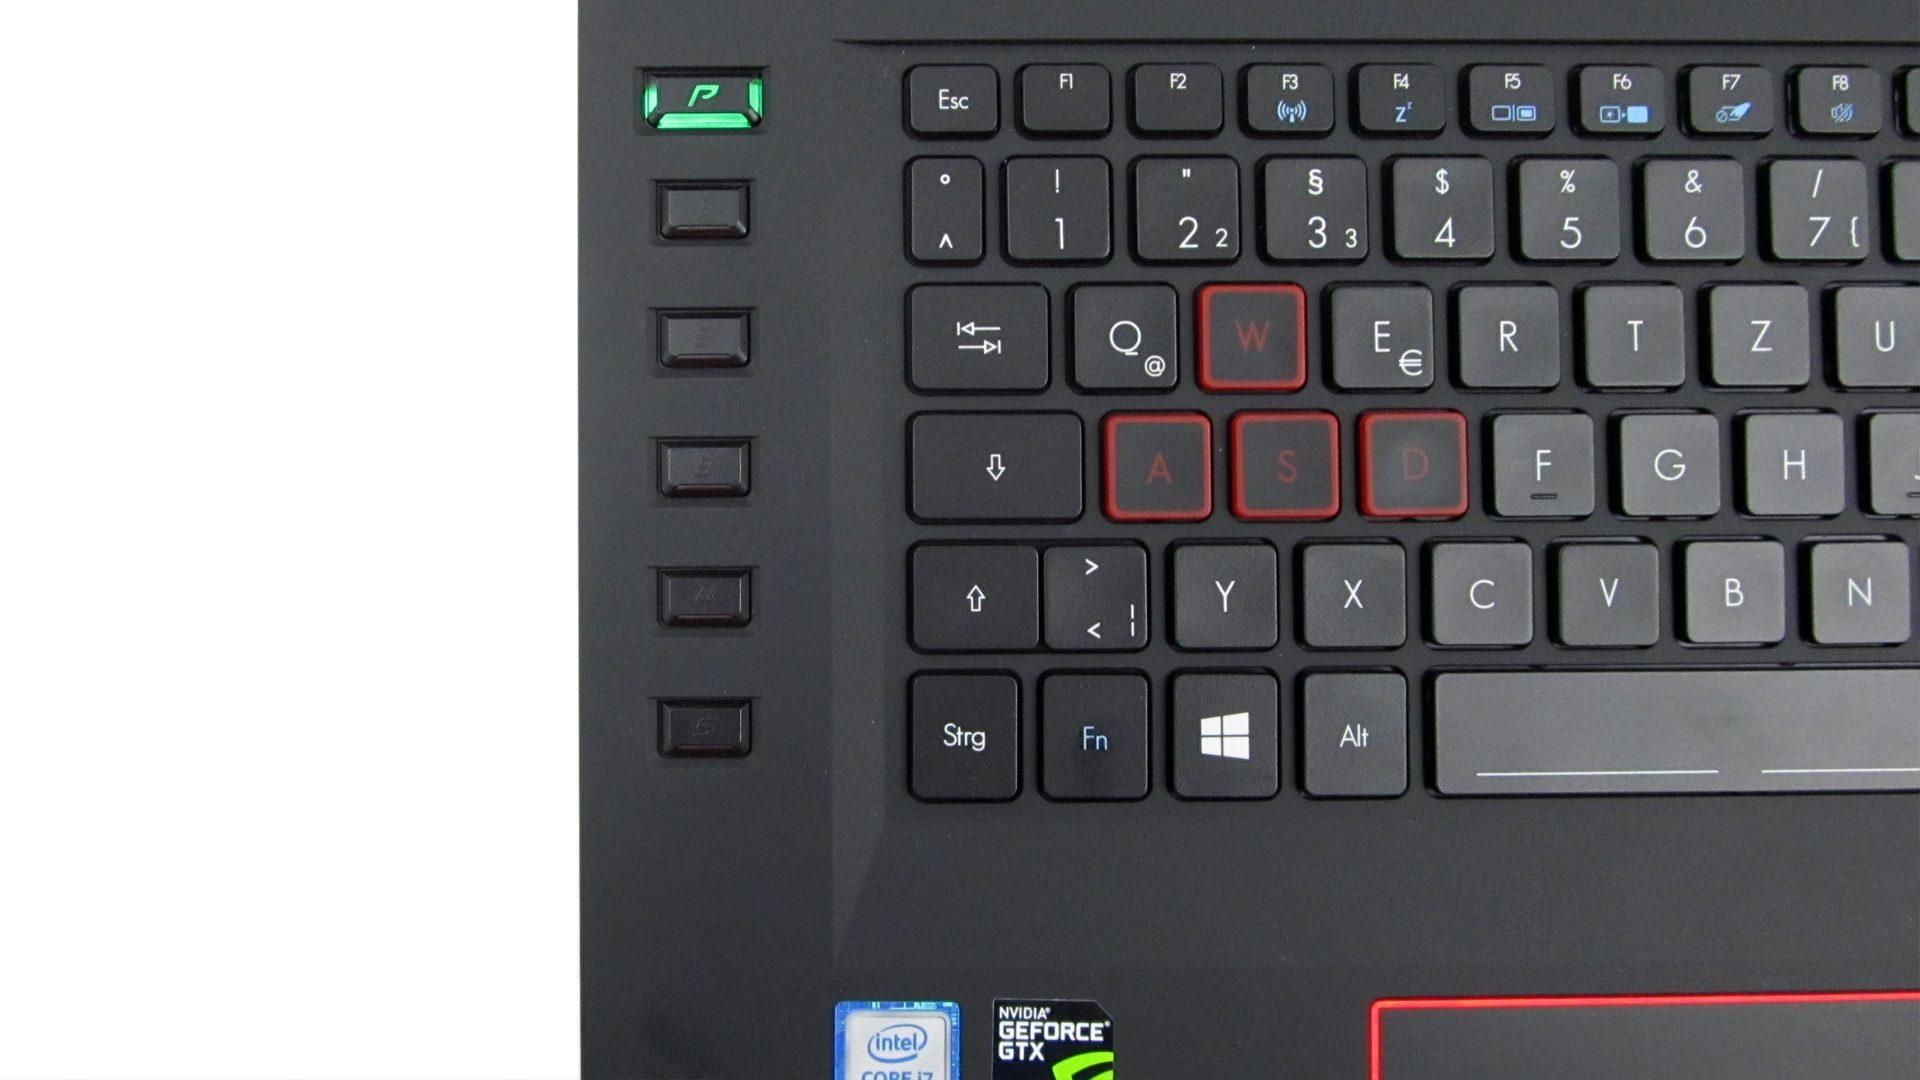 Acer-Predator-17-G9-793-718-Tastatur_3